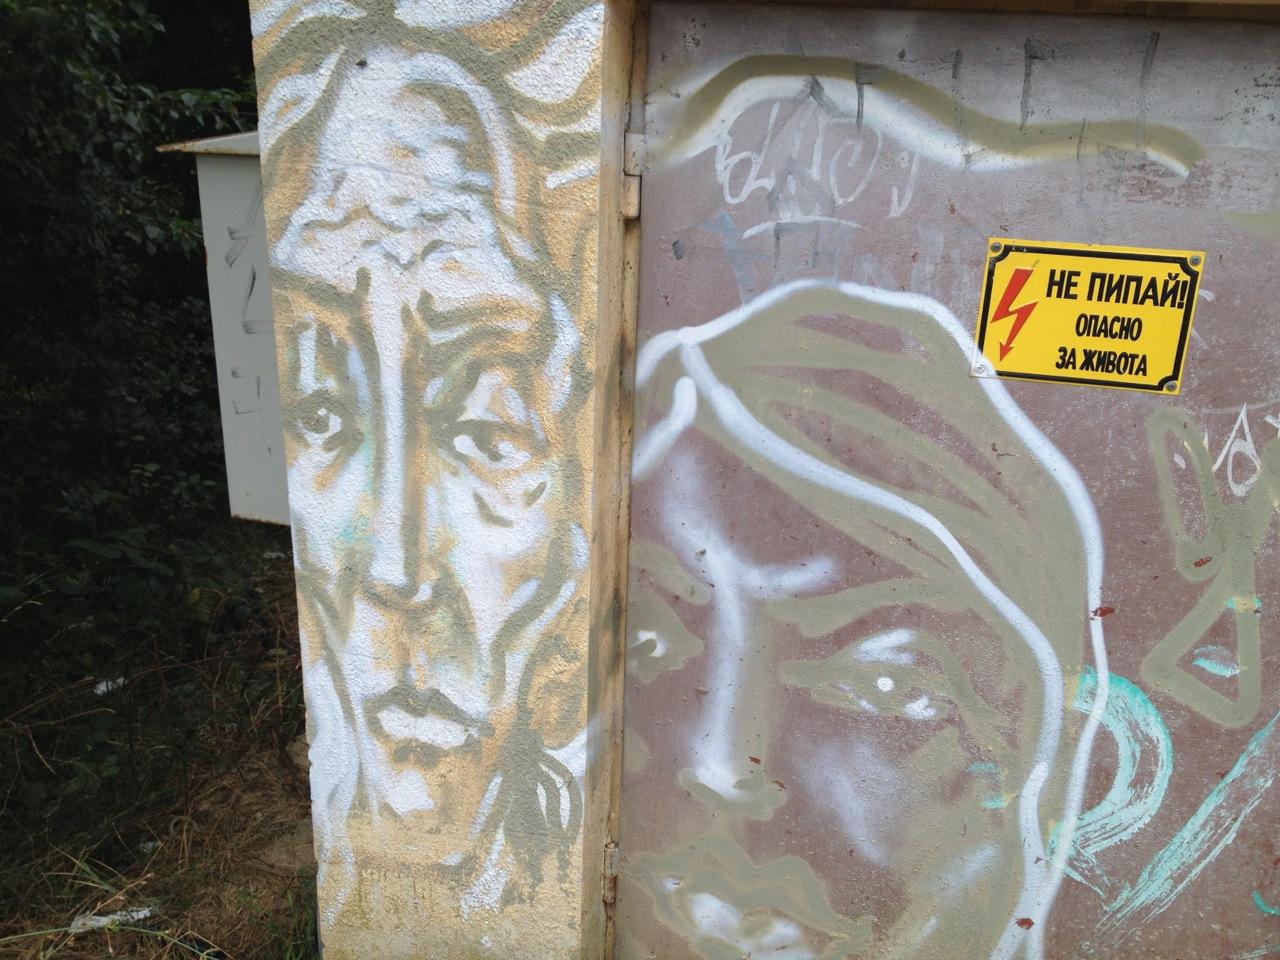 Street Art in Bulgarsko Chernomorie